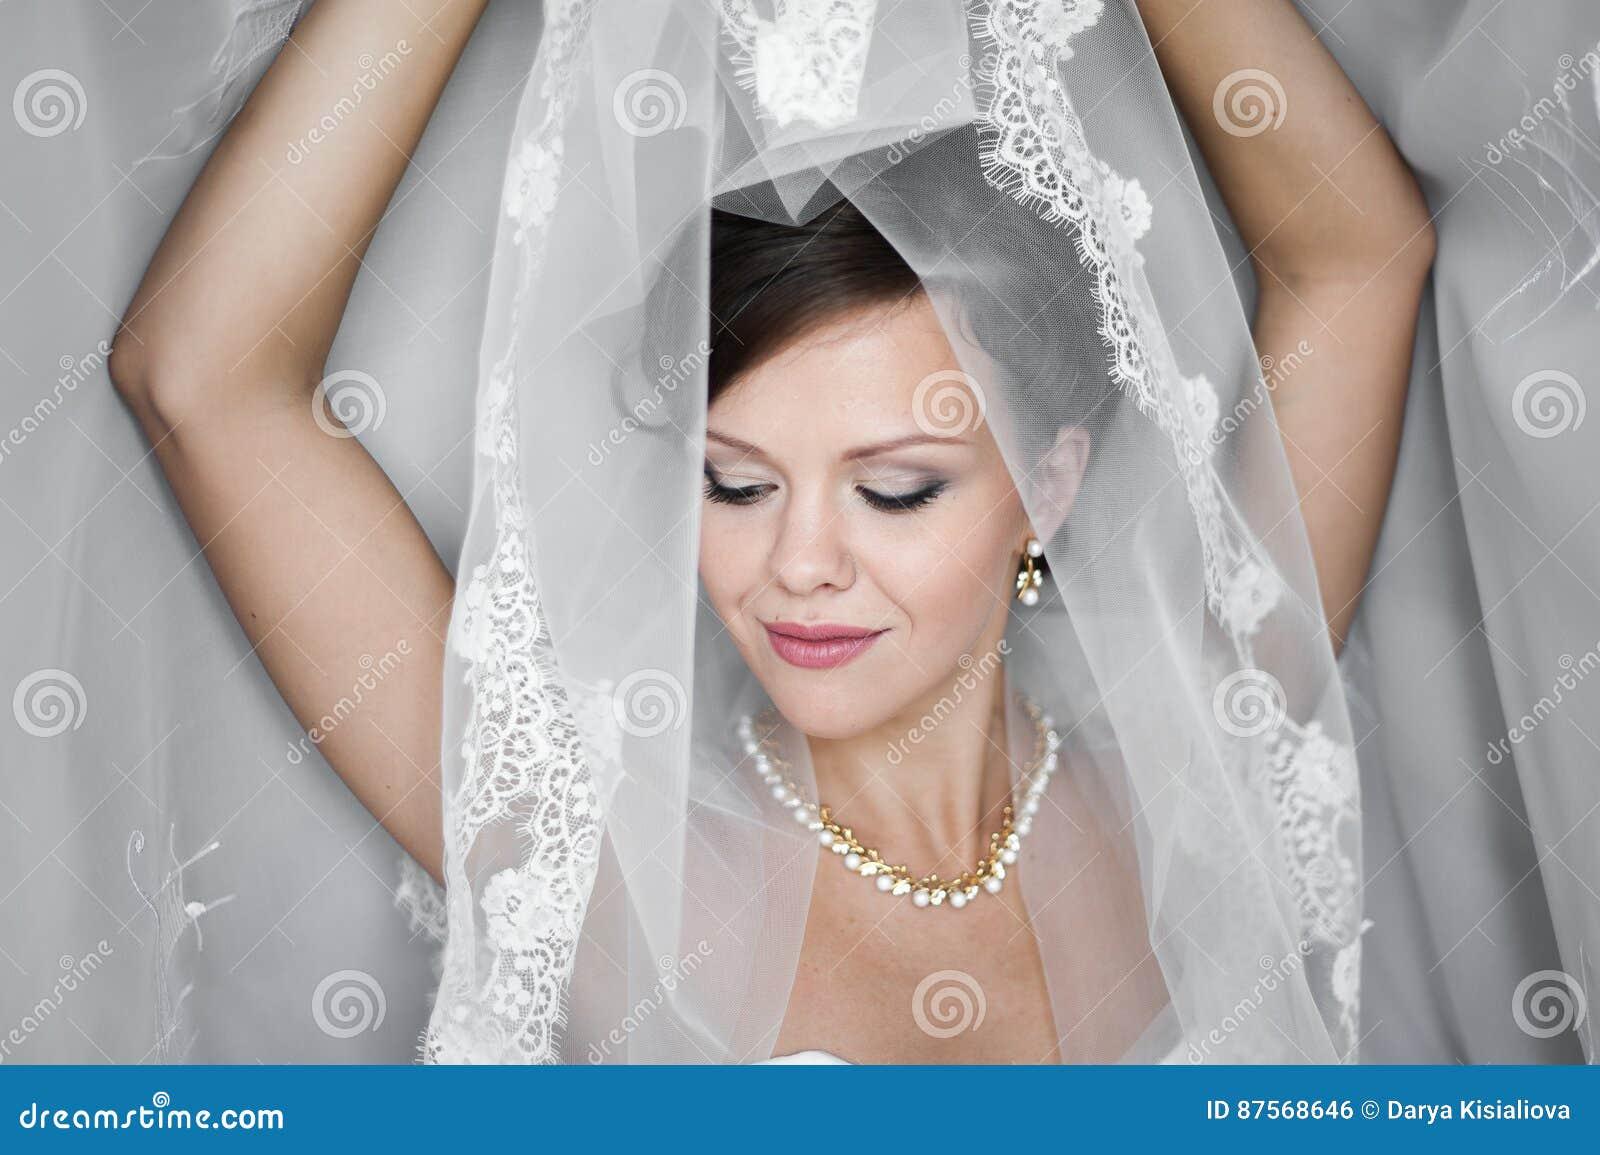 9a7de3d87eb Πορτρέτο της όμορφης νύφης με την τοποθέτηση πέπλων μόδας στο σπίτι ...